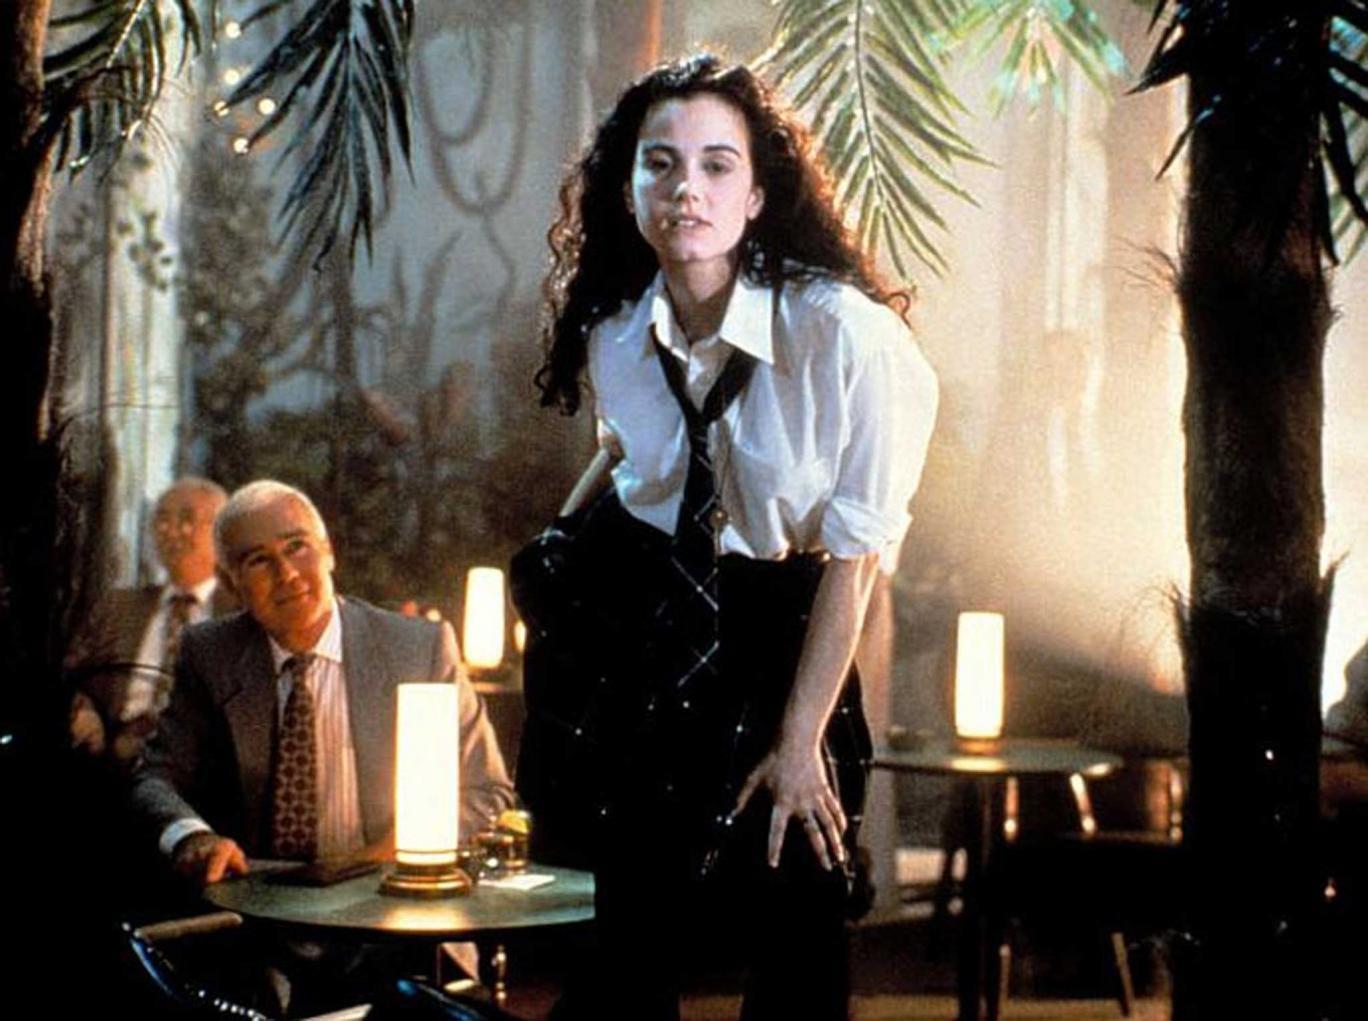 Shocking, surprising and desperately sad: Mia Kirshner stars in Exotica